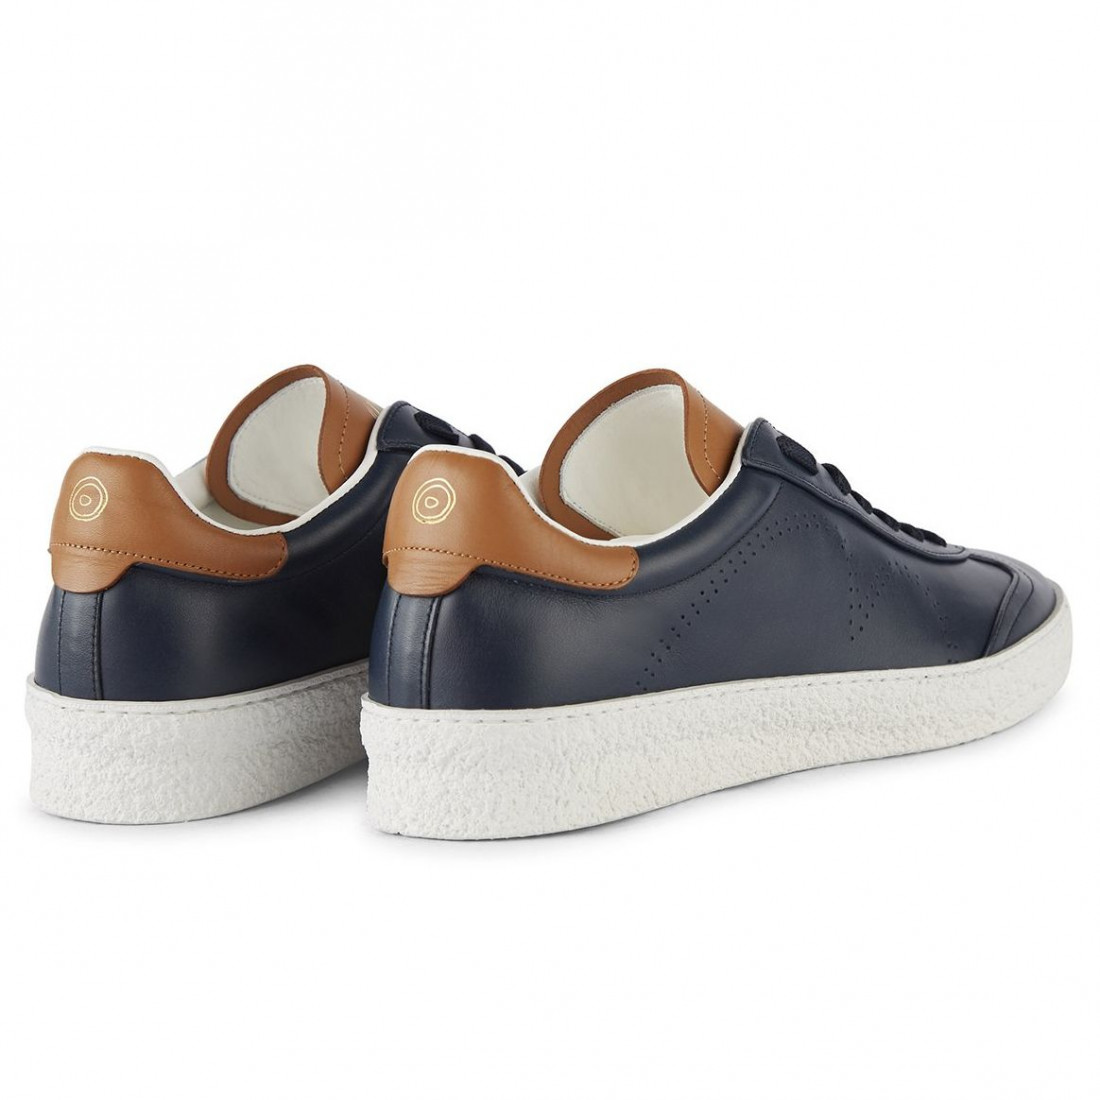 sneakers man barracuda bu3095d06pmt06ib30 4350